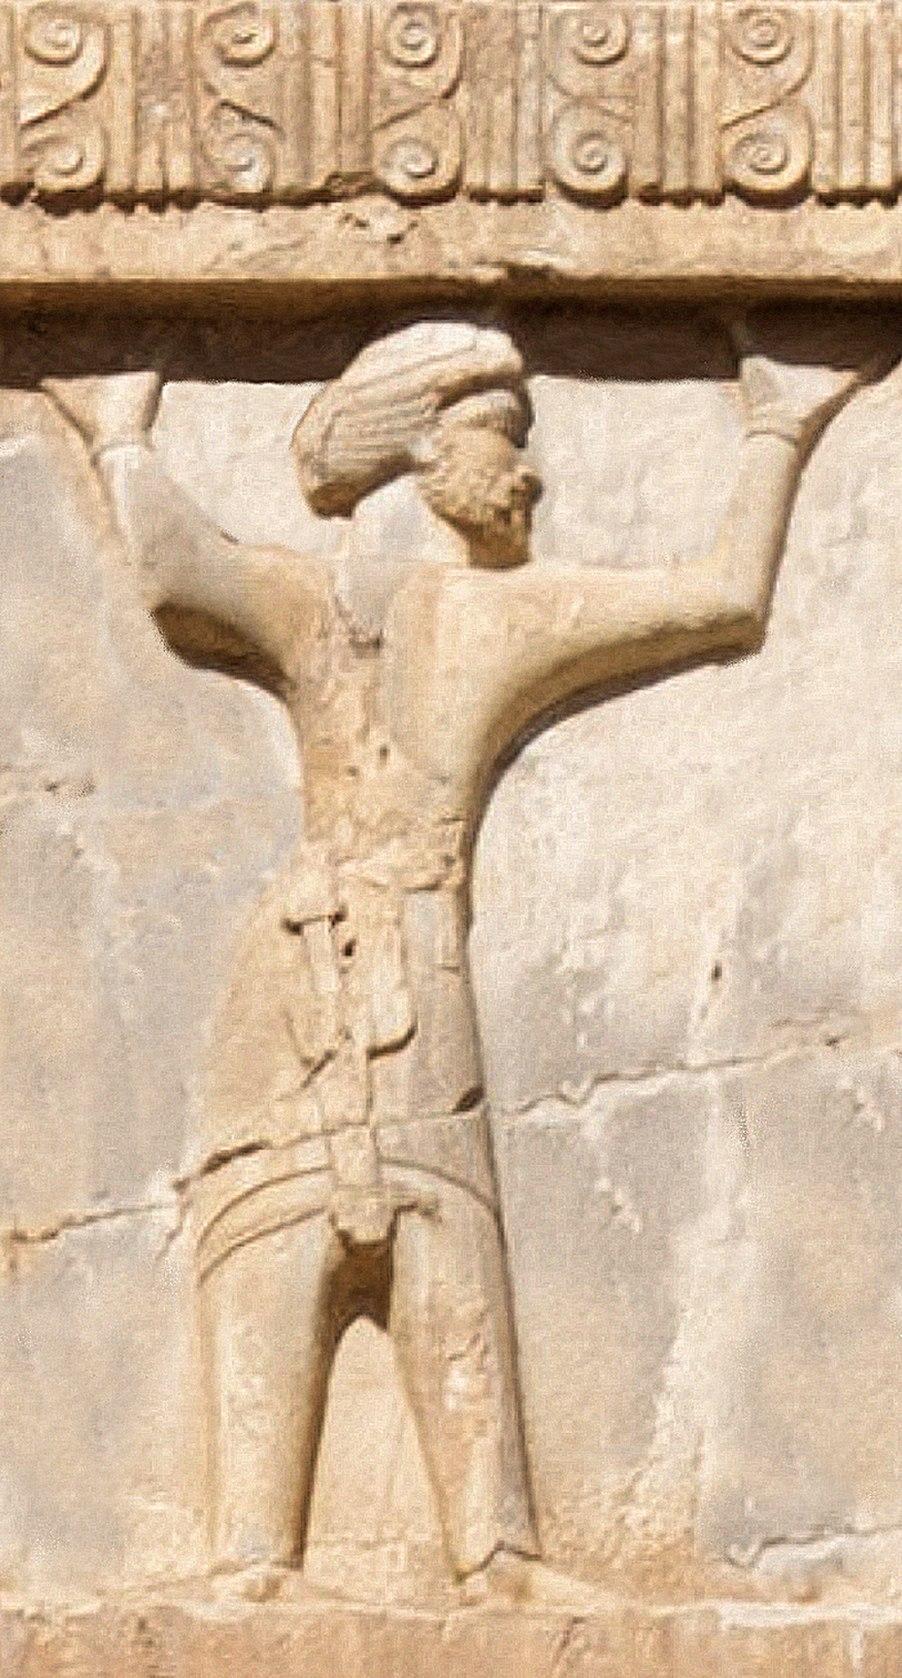 Xerxes I tomb Armenian soldier circa 470 BCE